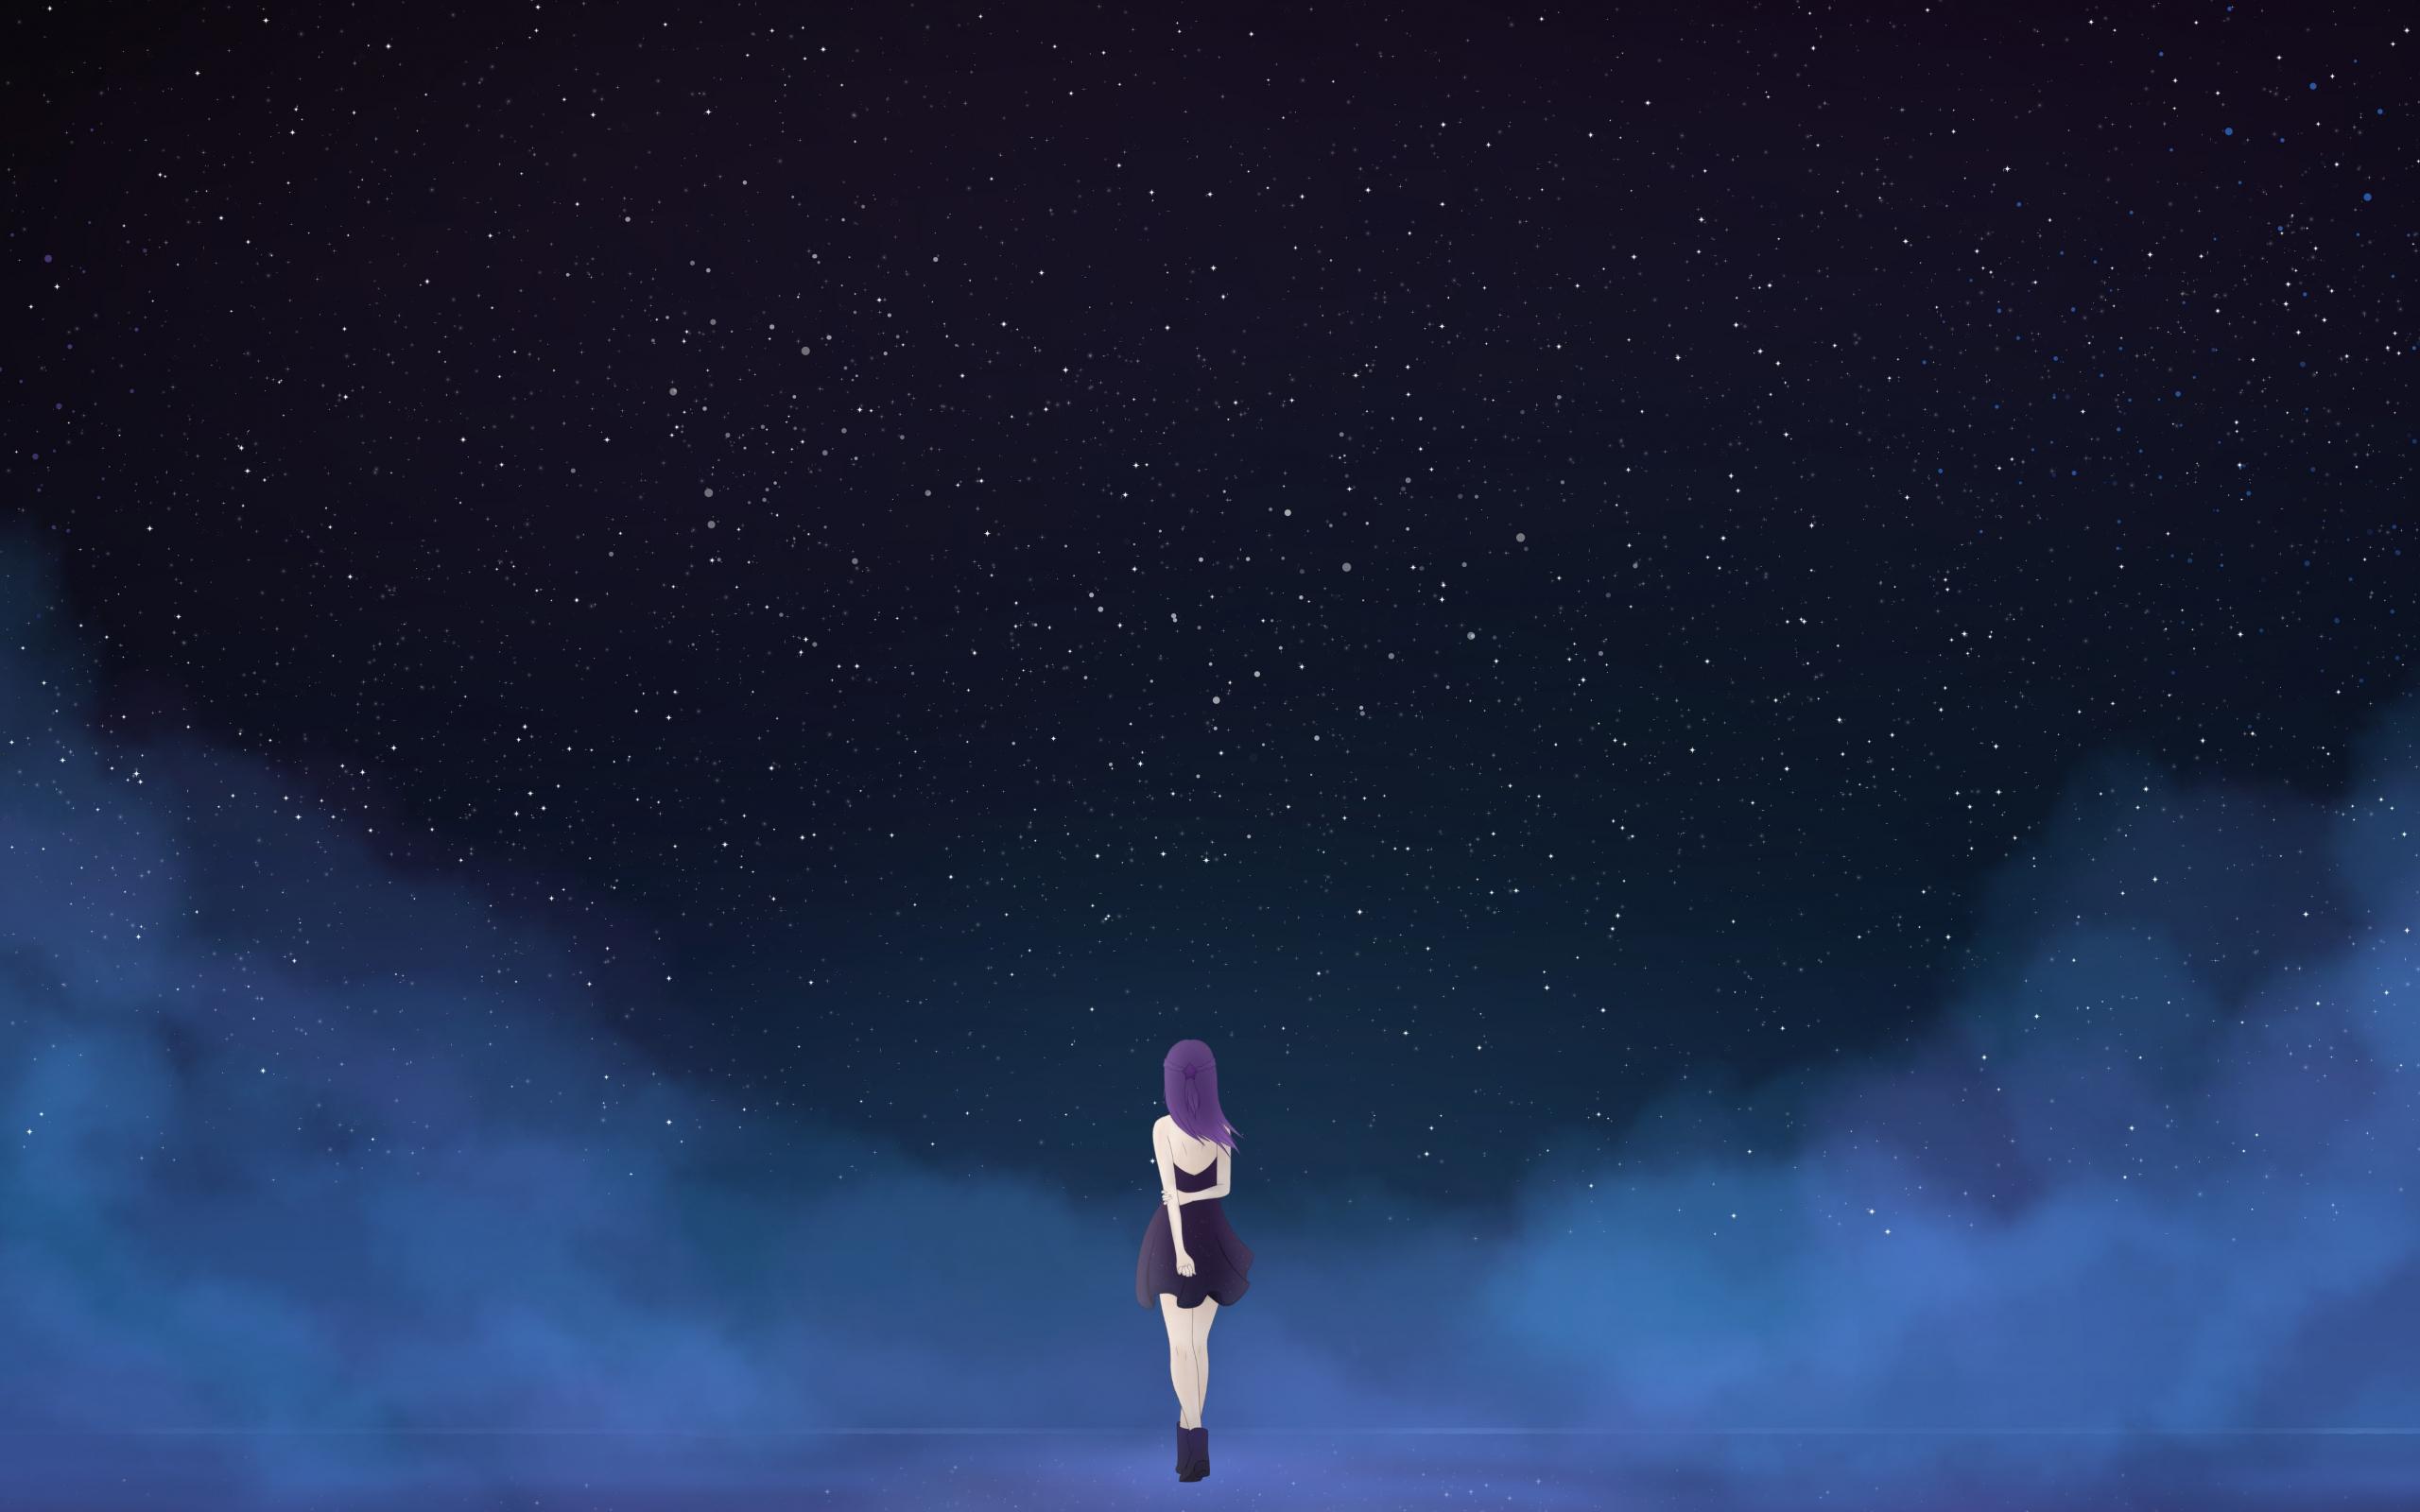 25 Anime Sky Wallpaper Night Sachi Wallpaper